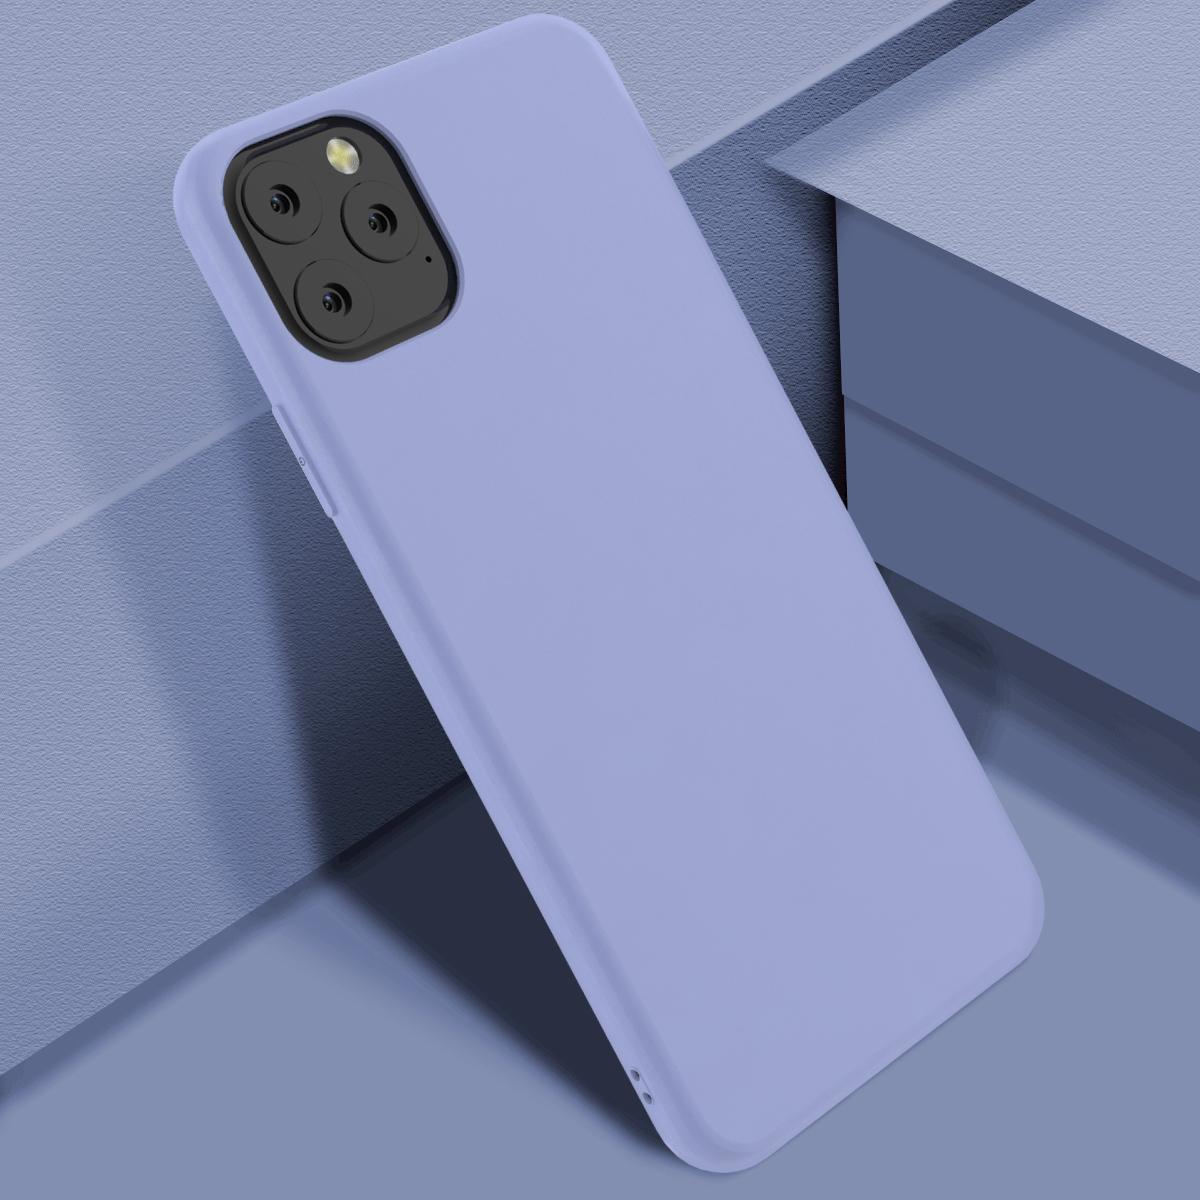 Torubia Silicone Case for iPhone 11/11 Pro/11 Pro Max 118